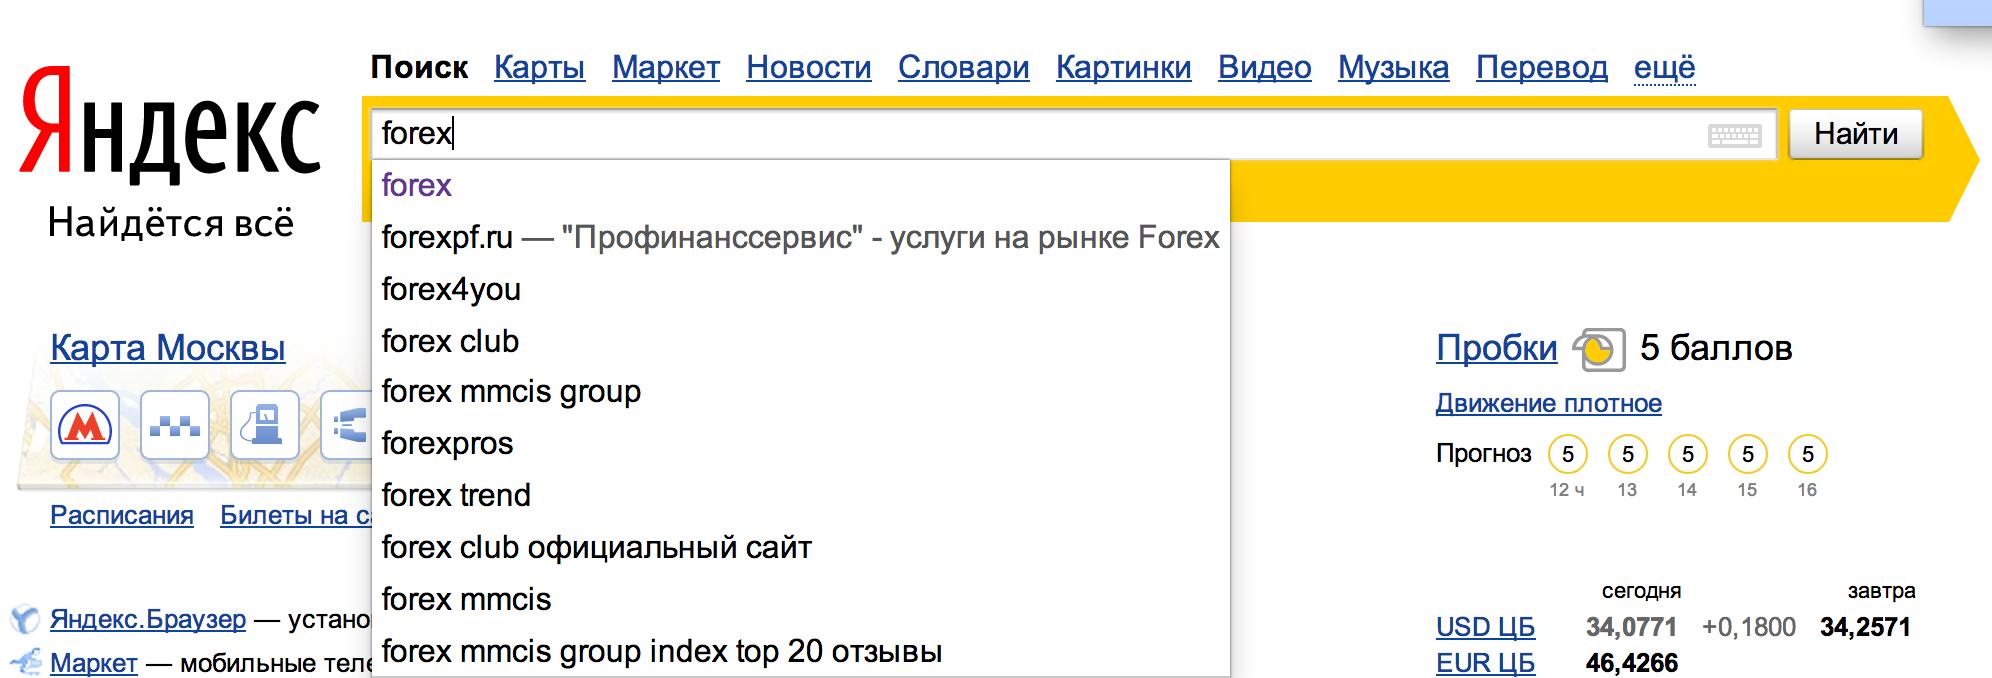 http://images.vfl.ru/ii/1404226624/097c2c8d/5595067.png